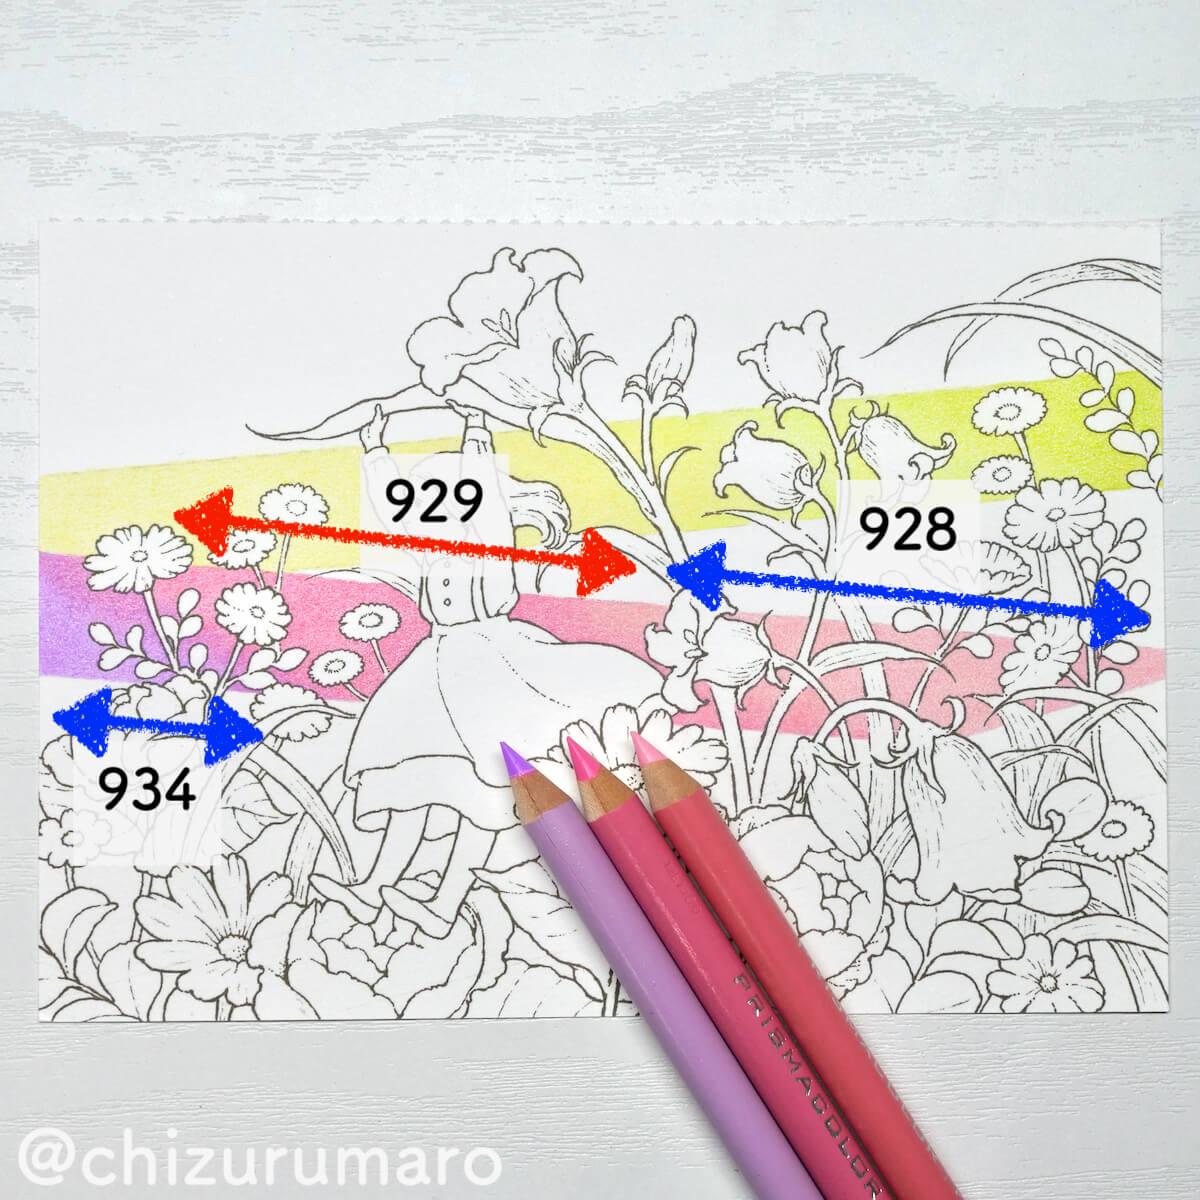 f:id:chizurumaro:20210917191910j:plain